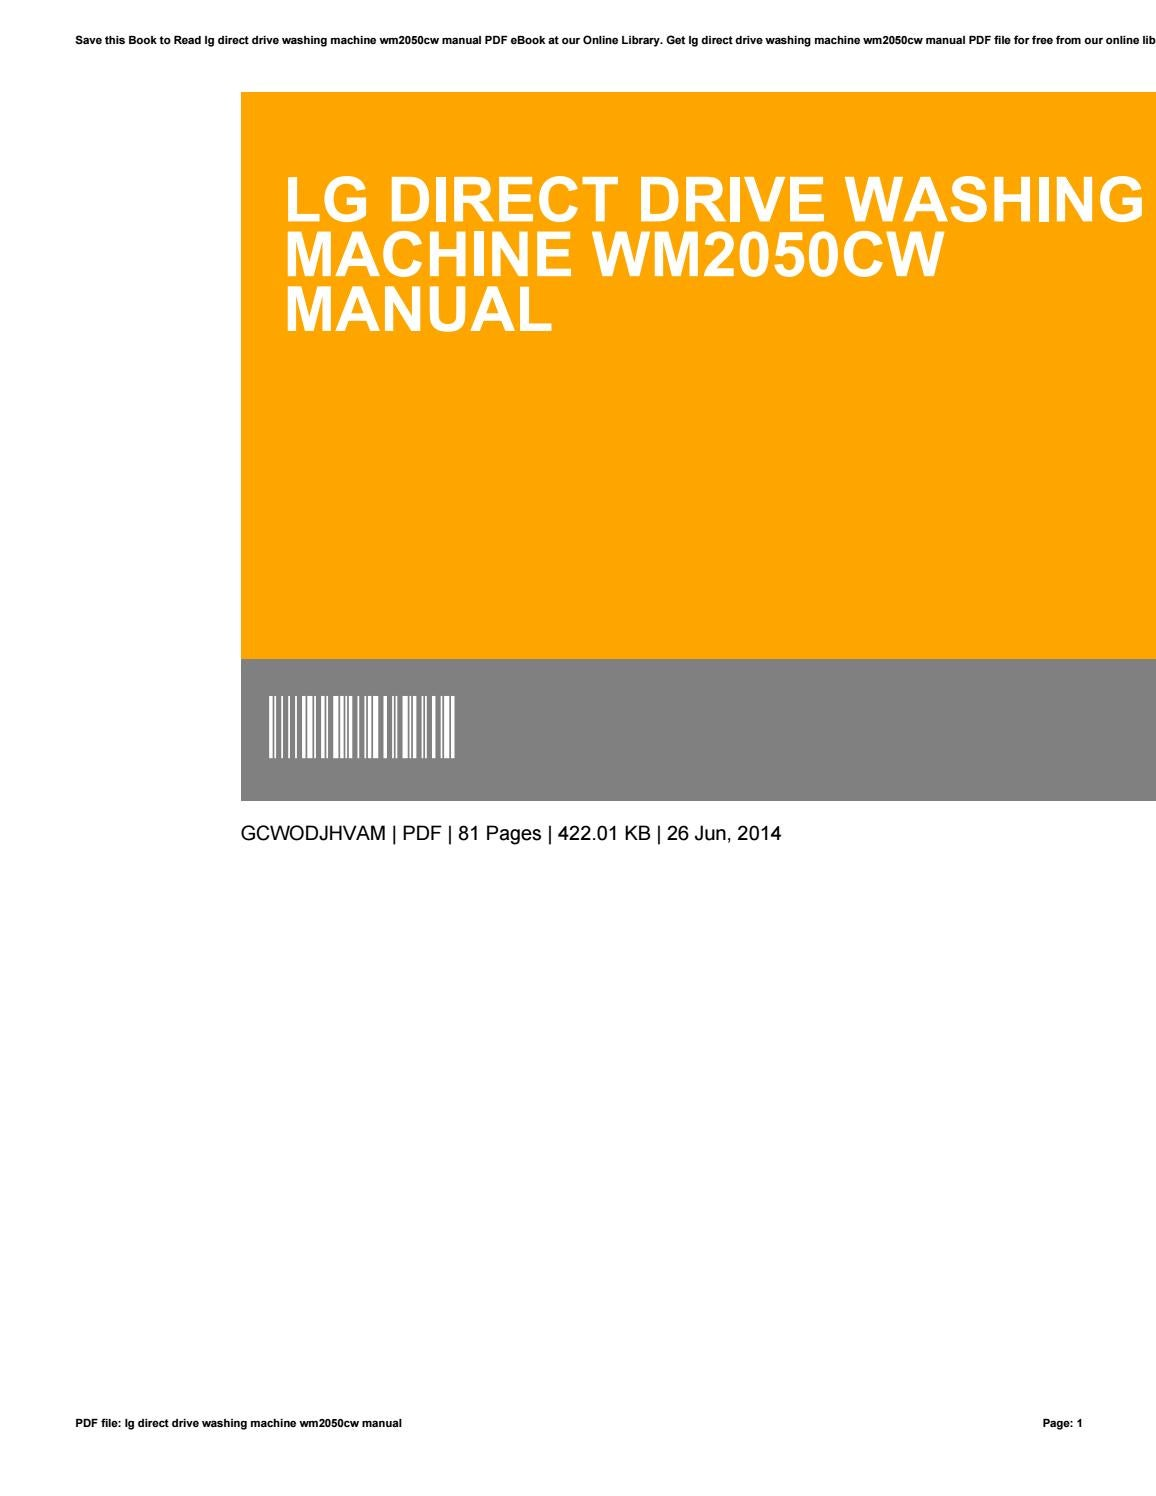 Lg Direct Drive Washing Machine Wm2050cw Manual By Asm99